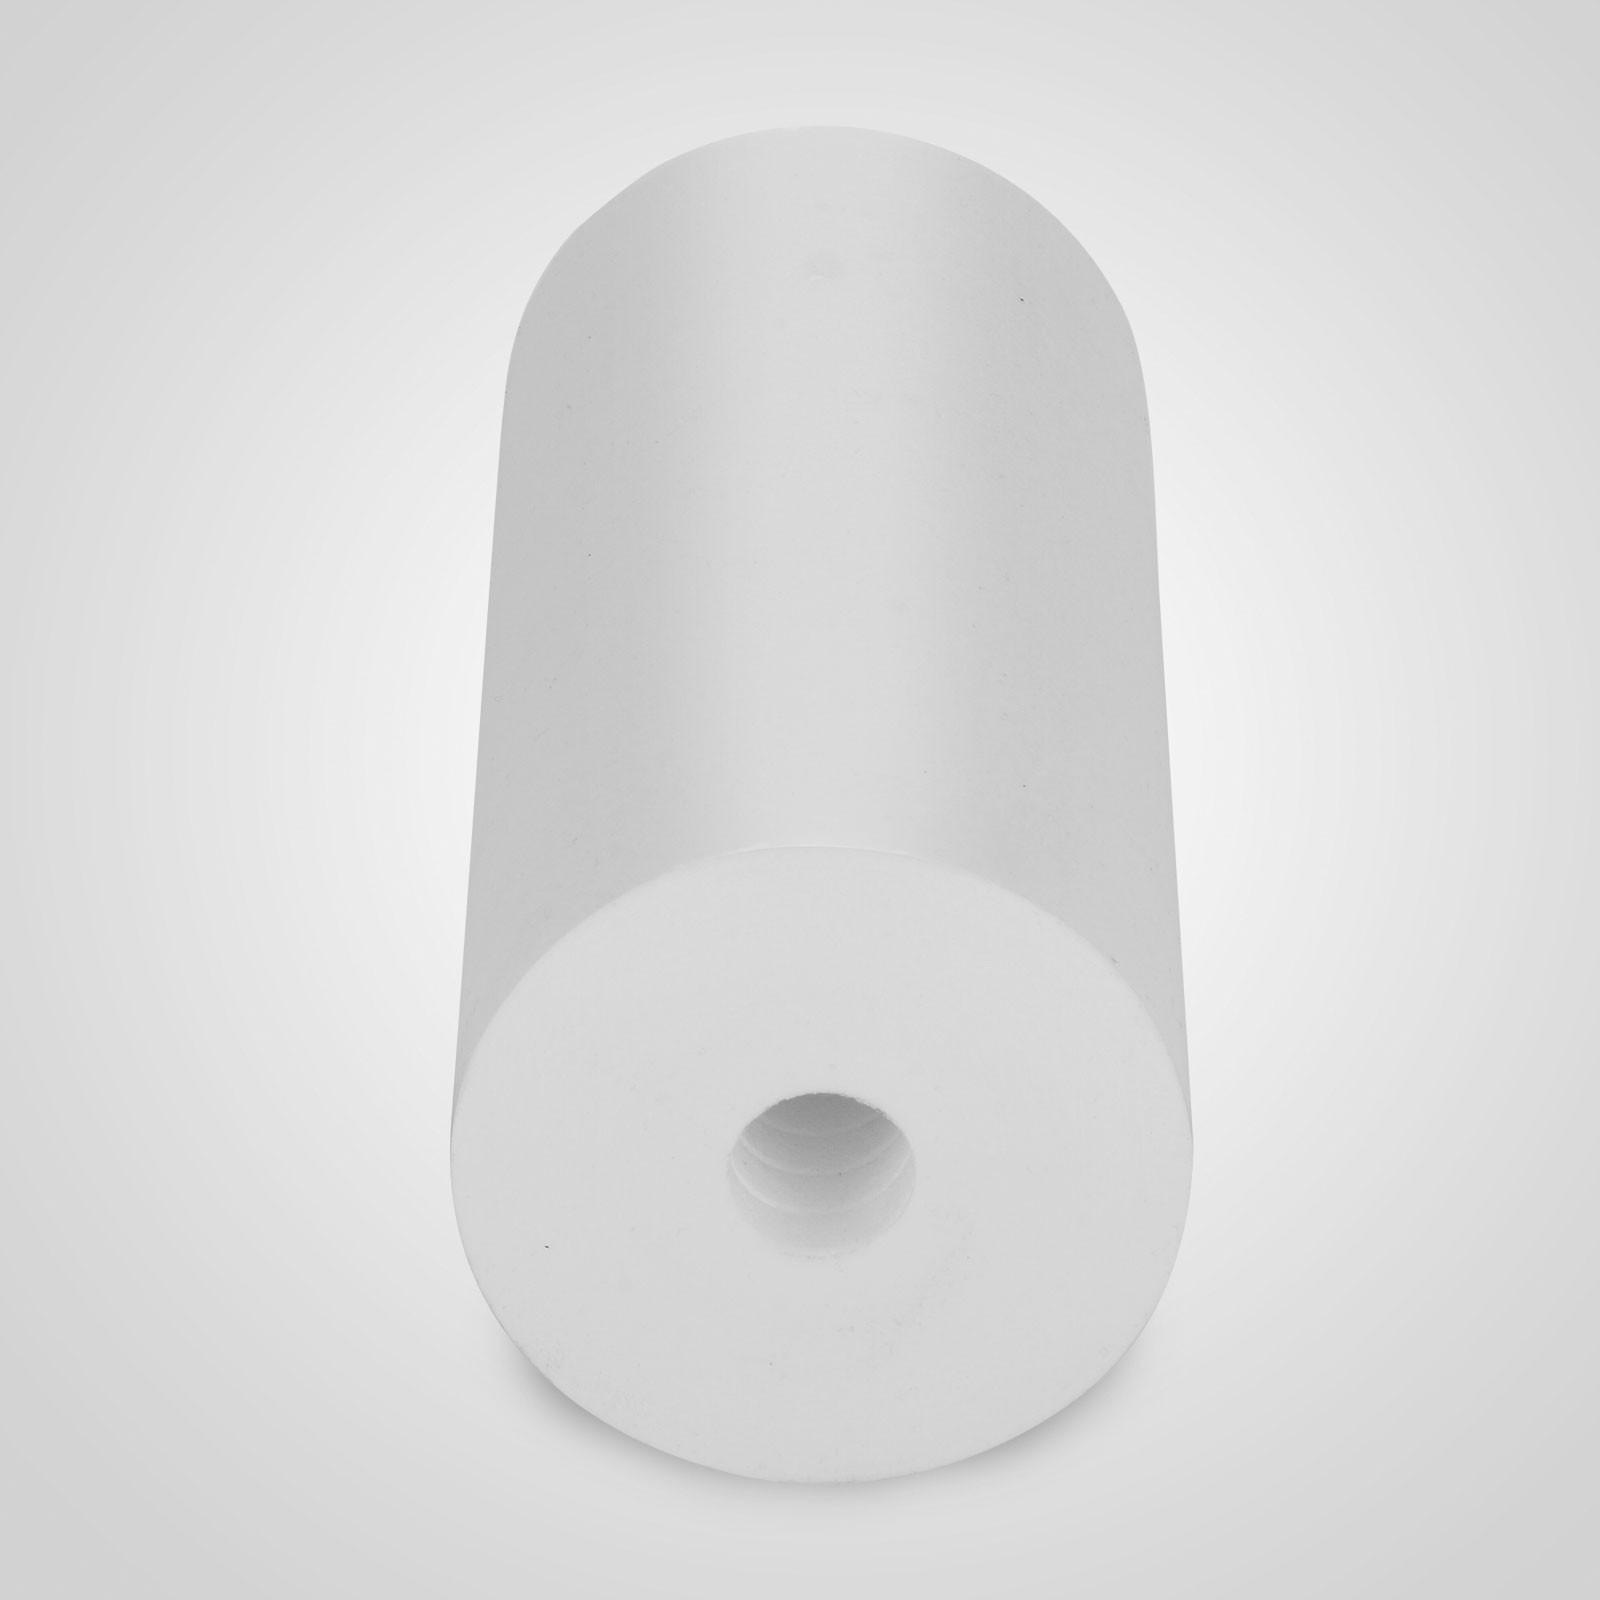 20Pcs-Cartouche-Filtrante-5-Micron-10-034-X-4-5-034-as-Brita-Emballe-Individu-Bobine miniature 7